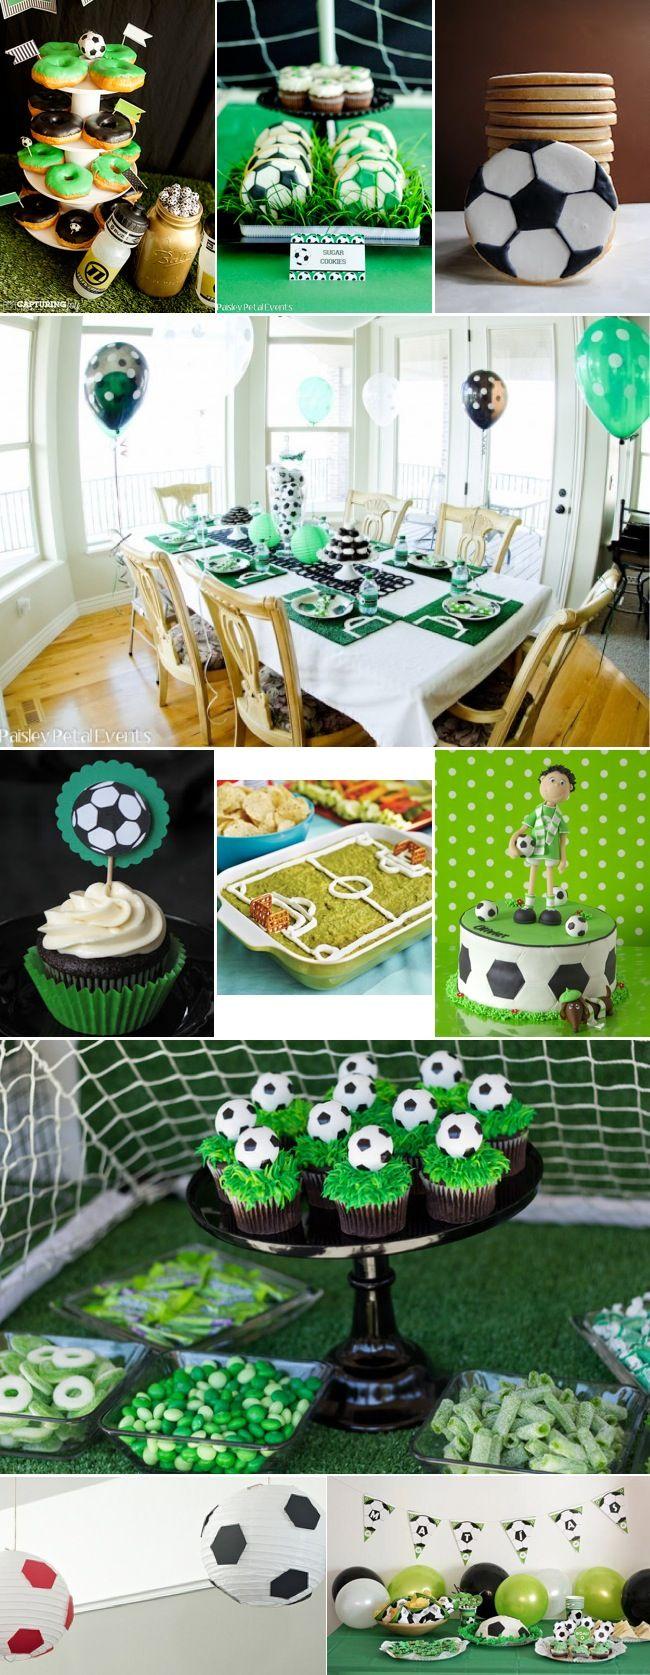 ms de ideas increbles sobre fiestas de cumpleaos solo en pinterest ideas para fiesta de cumpleaos para fiesta de cumpleaos y fiesta